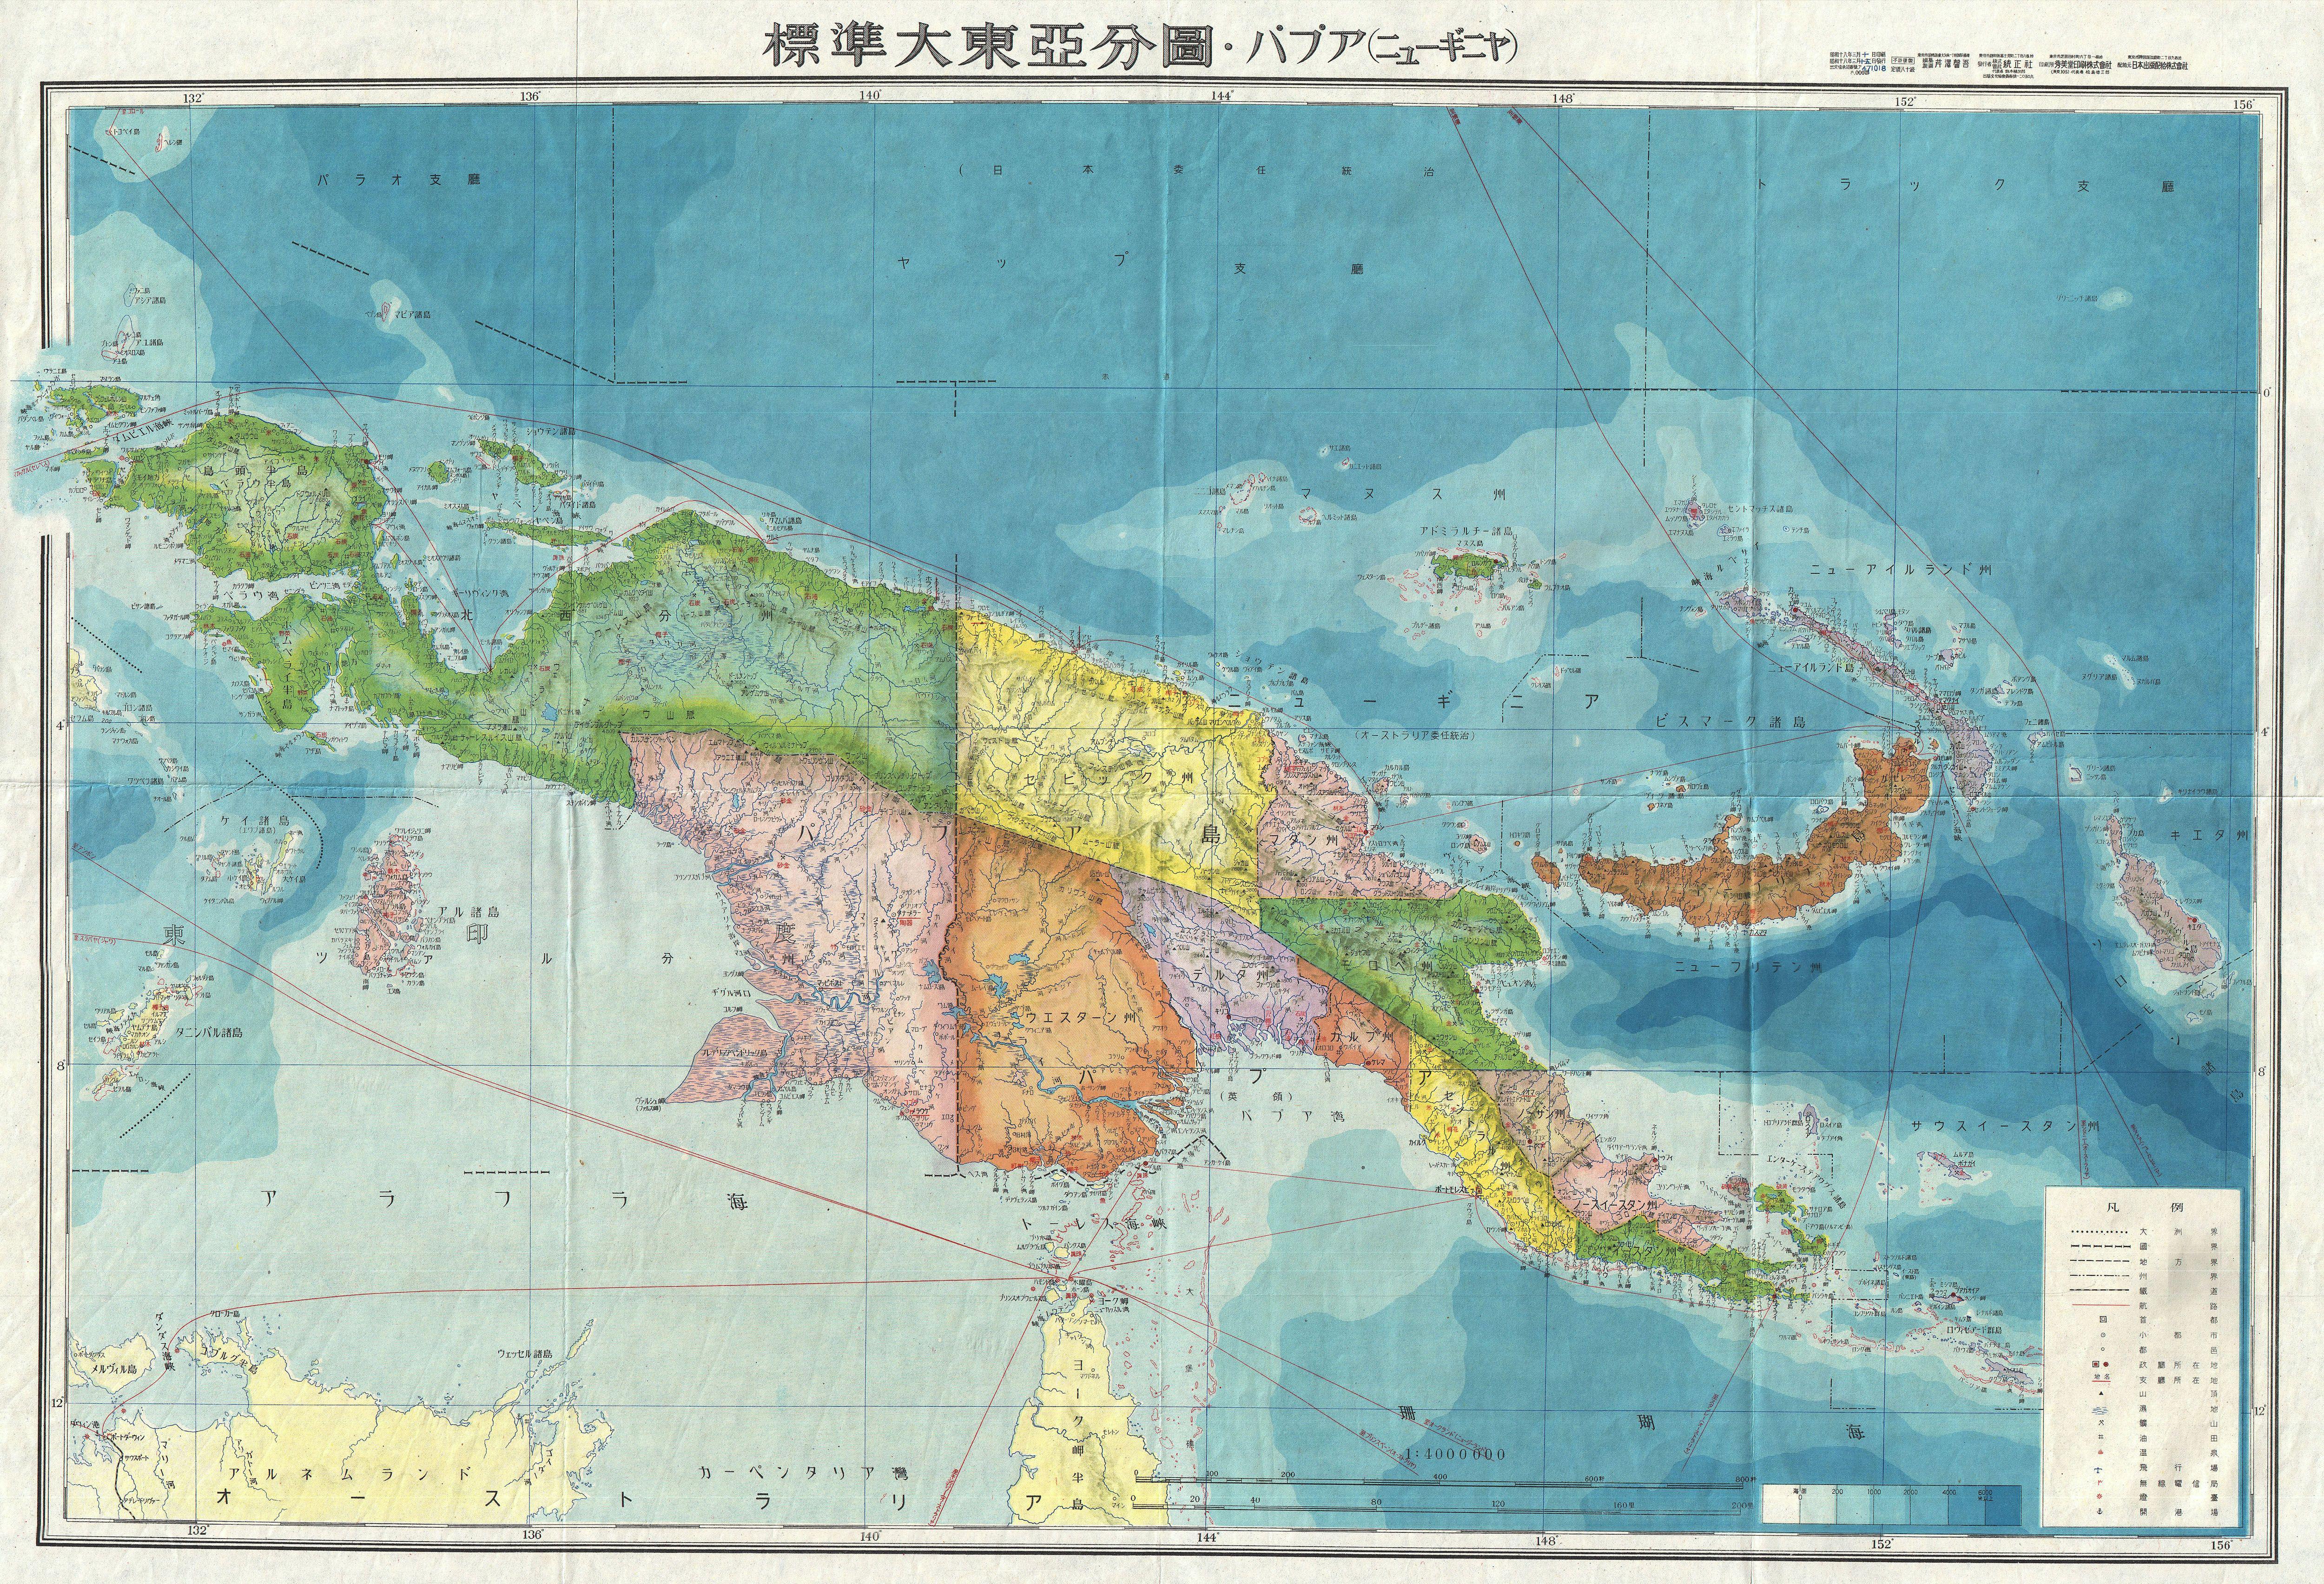 File 1943 World War II Japanese Aeronautical Map of New Guinea Geographicus